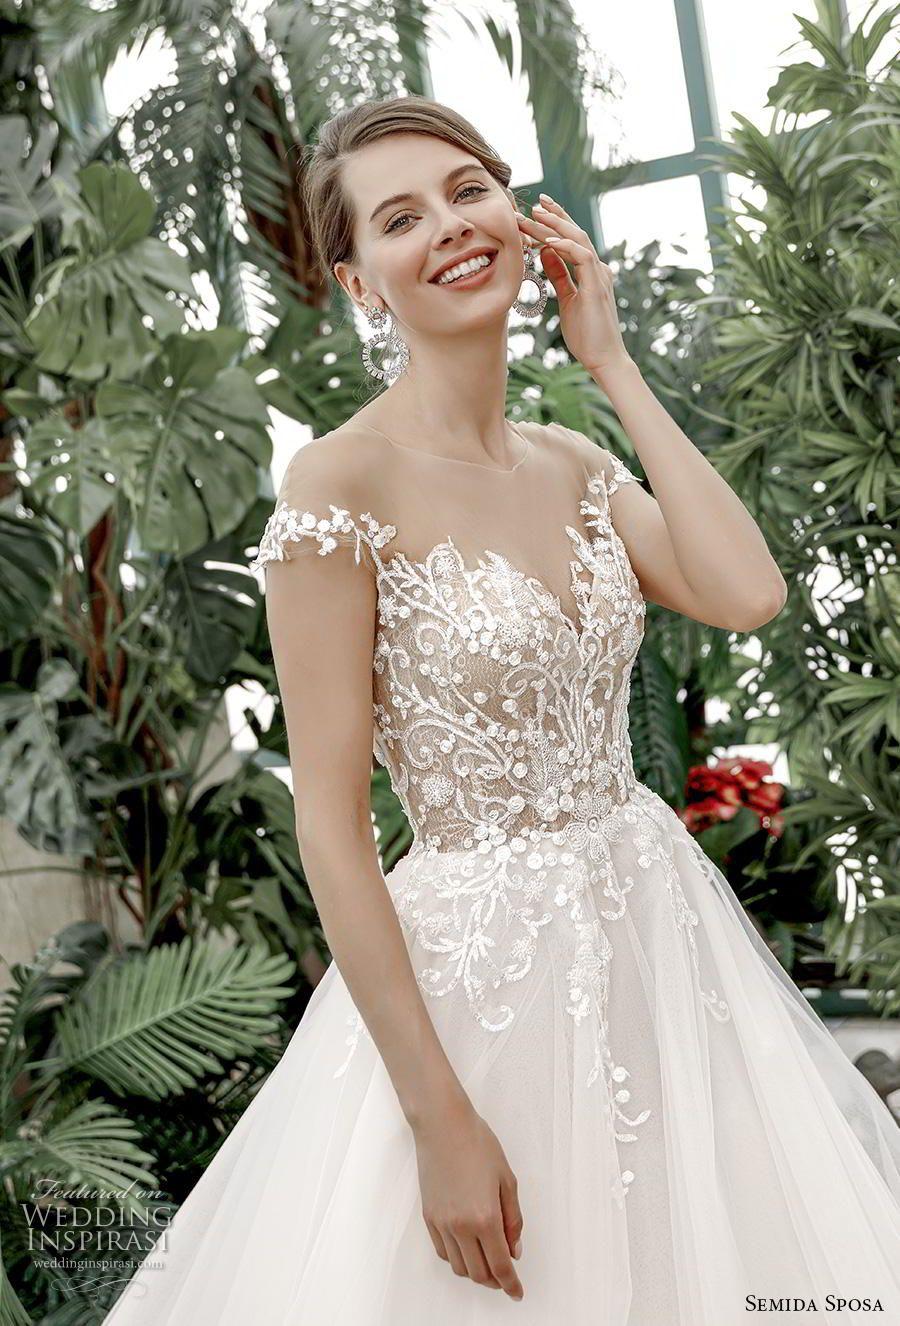 Semida Sposa 2020 Wedding Dresses Amazon Bridal Collection Wedding Inspirasi Wedding Dresses Amazon Spring Wedding Dress Wedding Dresses